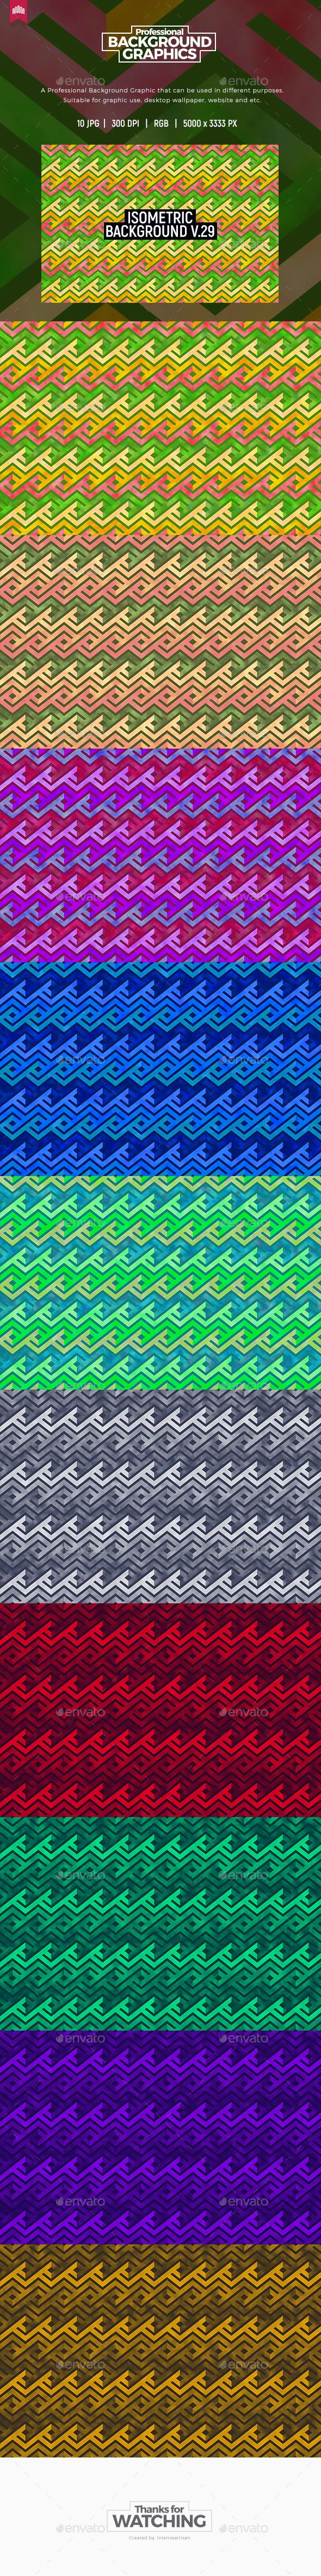 Isometric Background V.29 - Patterns Backgrounds